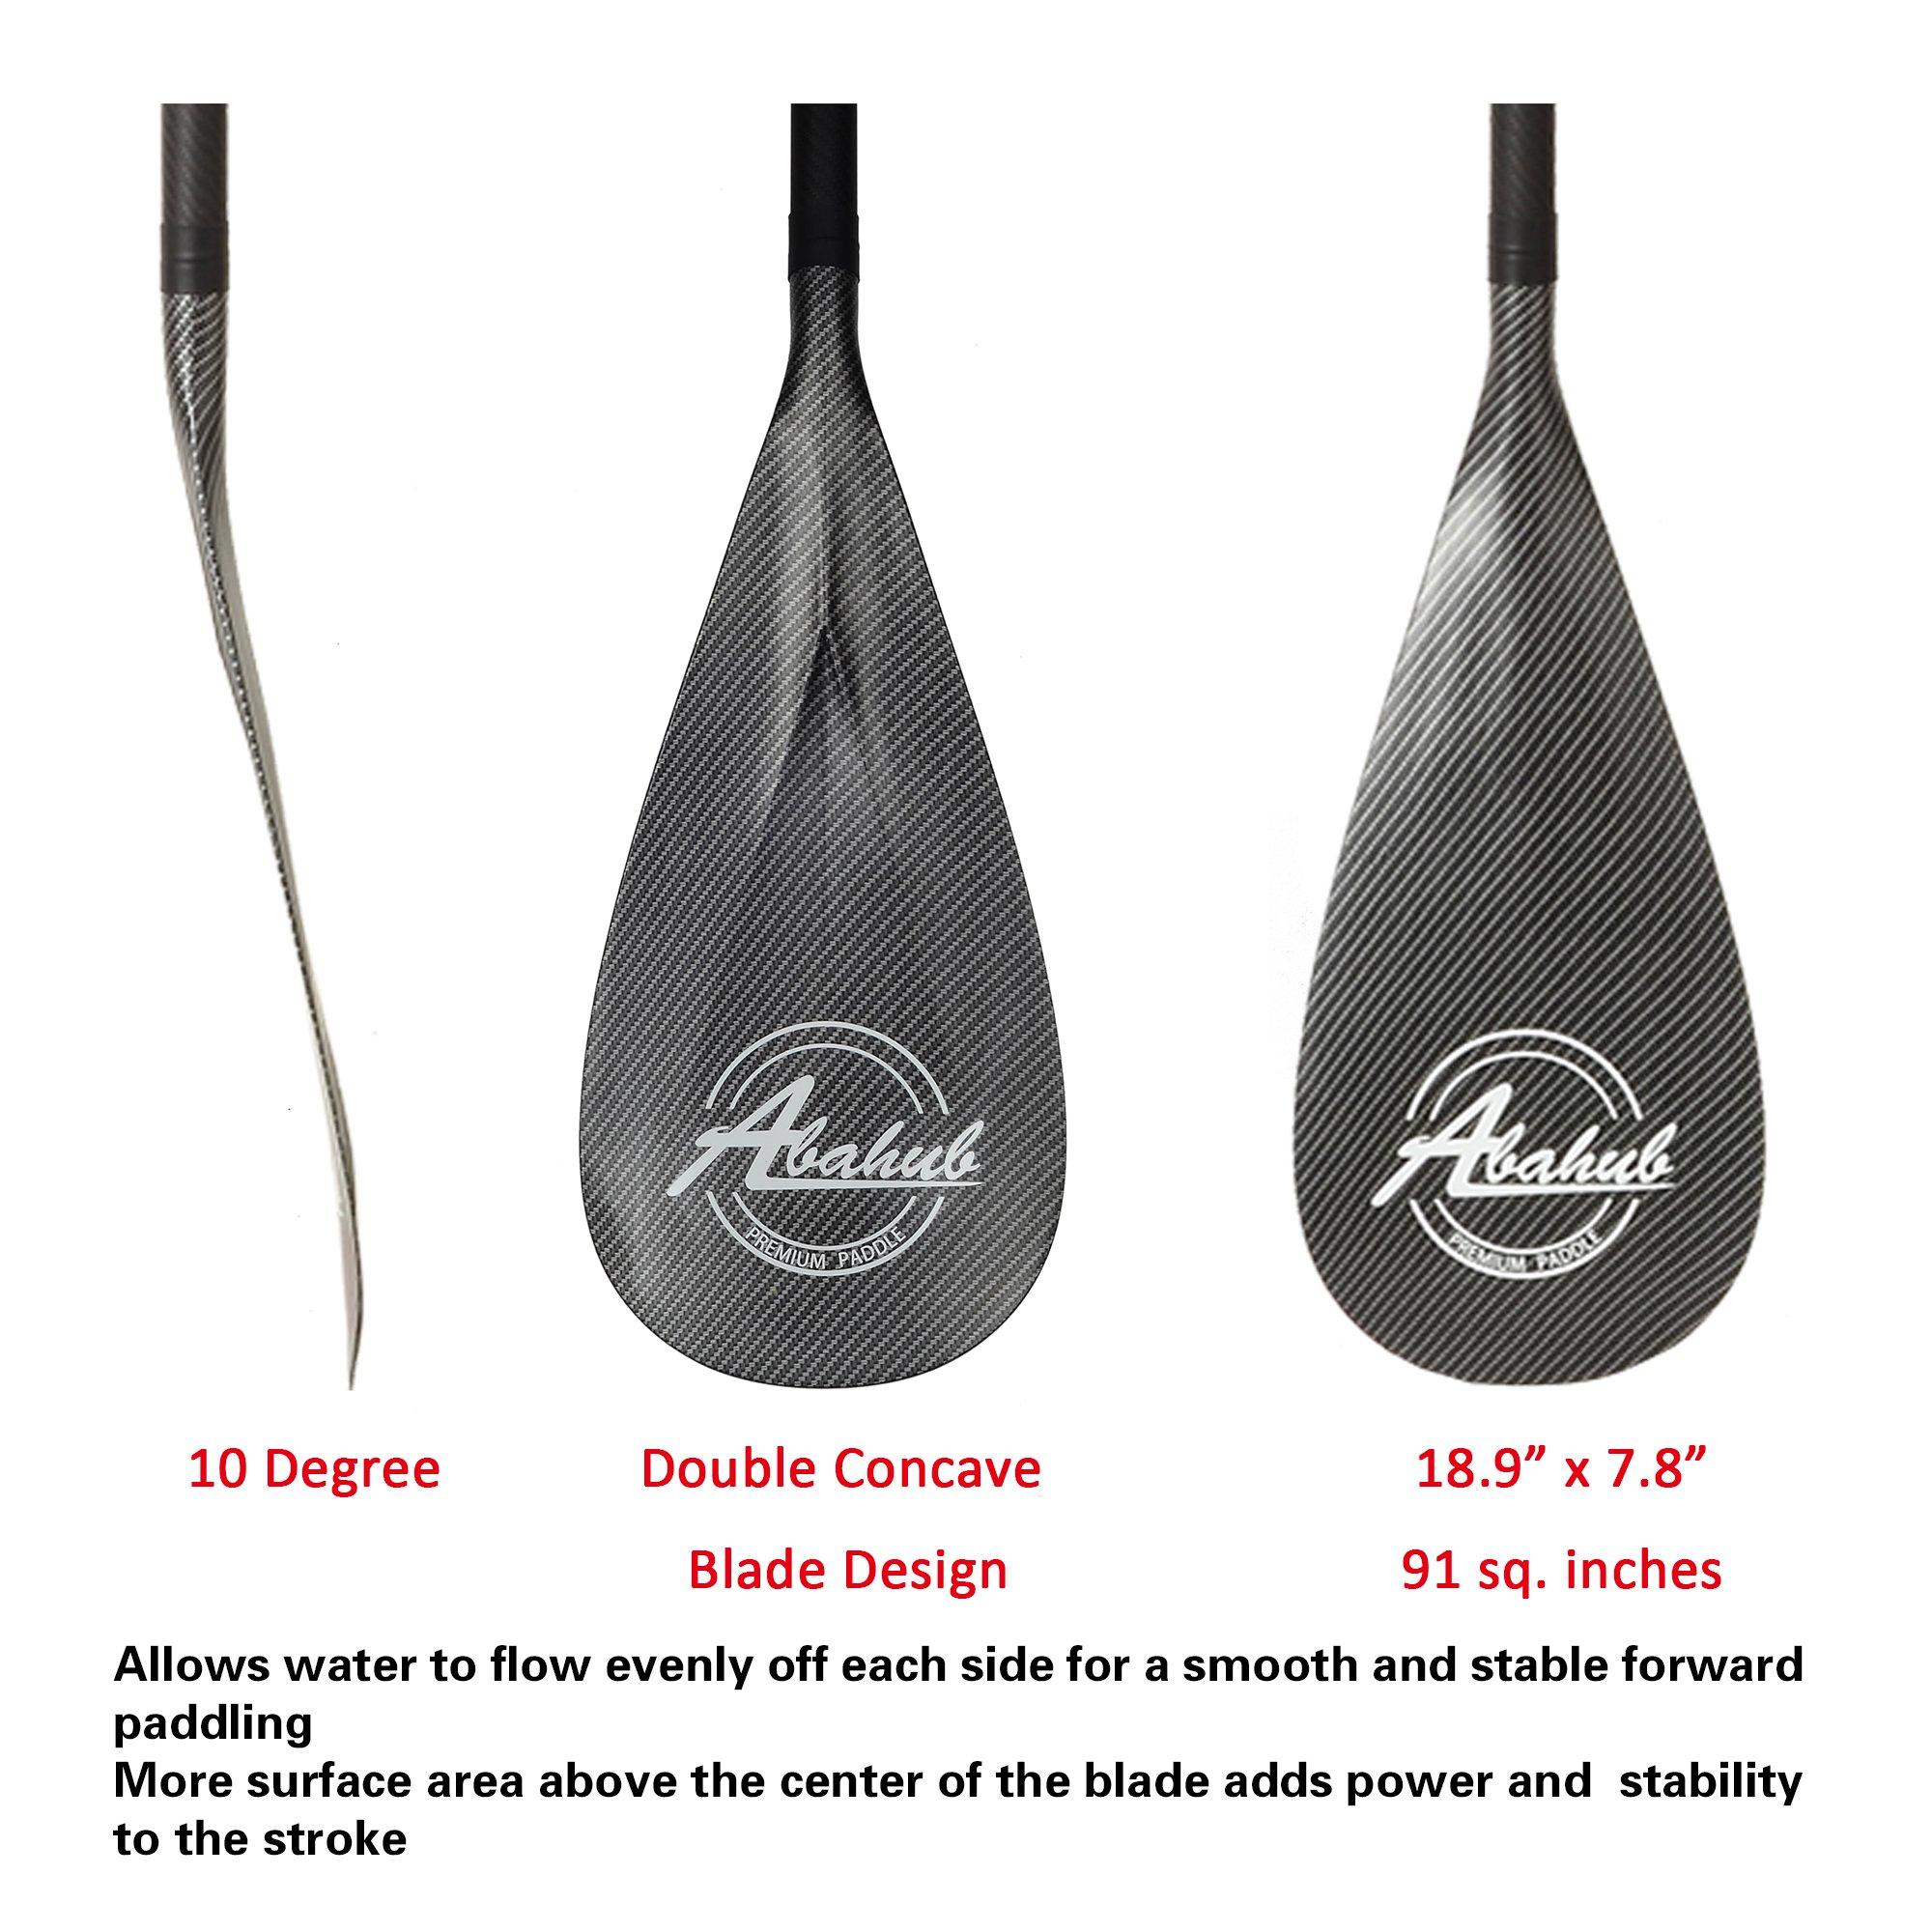 ABAHUB 3-Piece Adjustable Carbon Fiber SUP Paddle Carbon Shaft Carbon Print Plastic Blade + Bag by ABAHUB (Image #6)